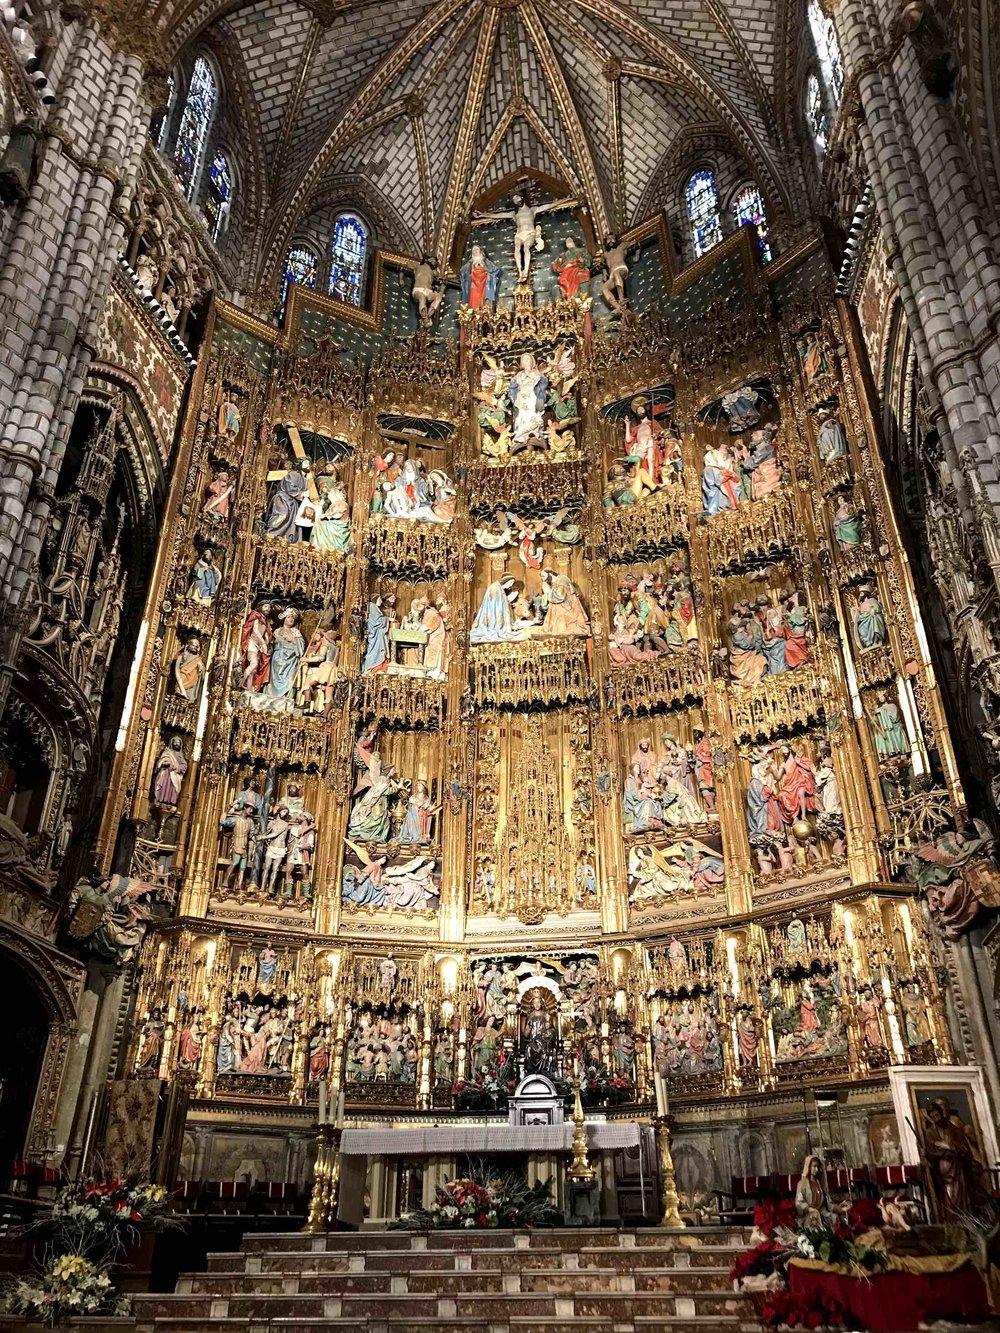 ChurchColorfulWallOfSaintsIMG_9492.jpg